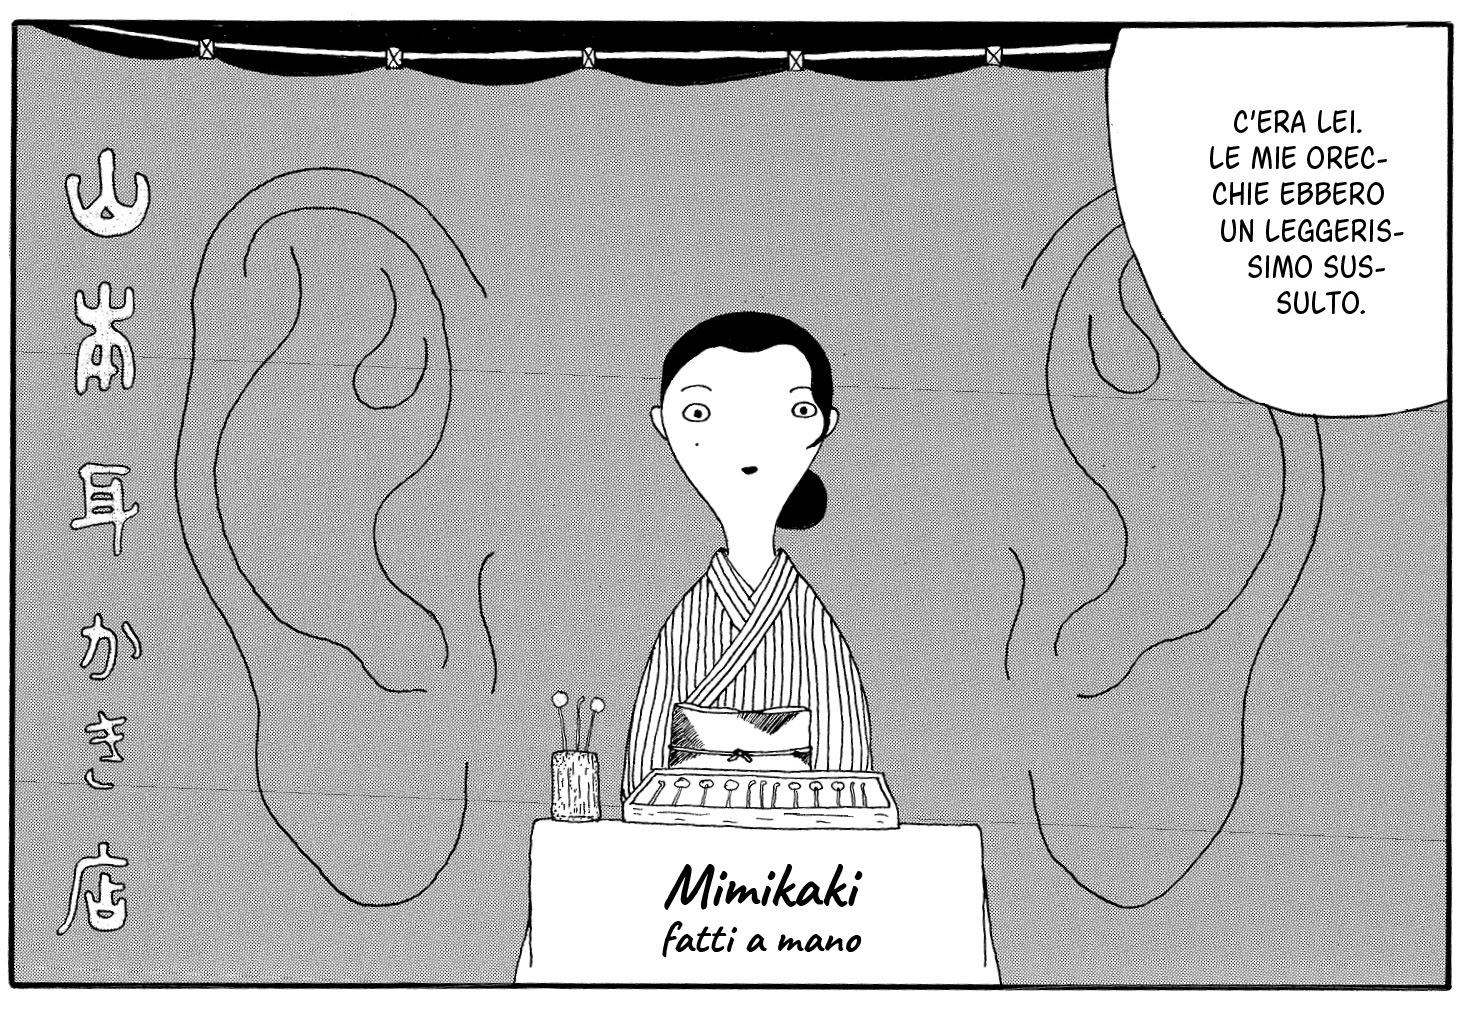 Mimikaki Tavola Yaro Abe